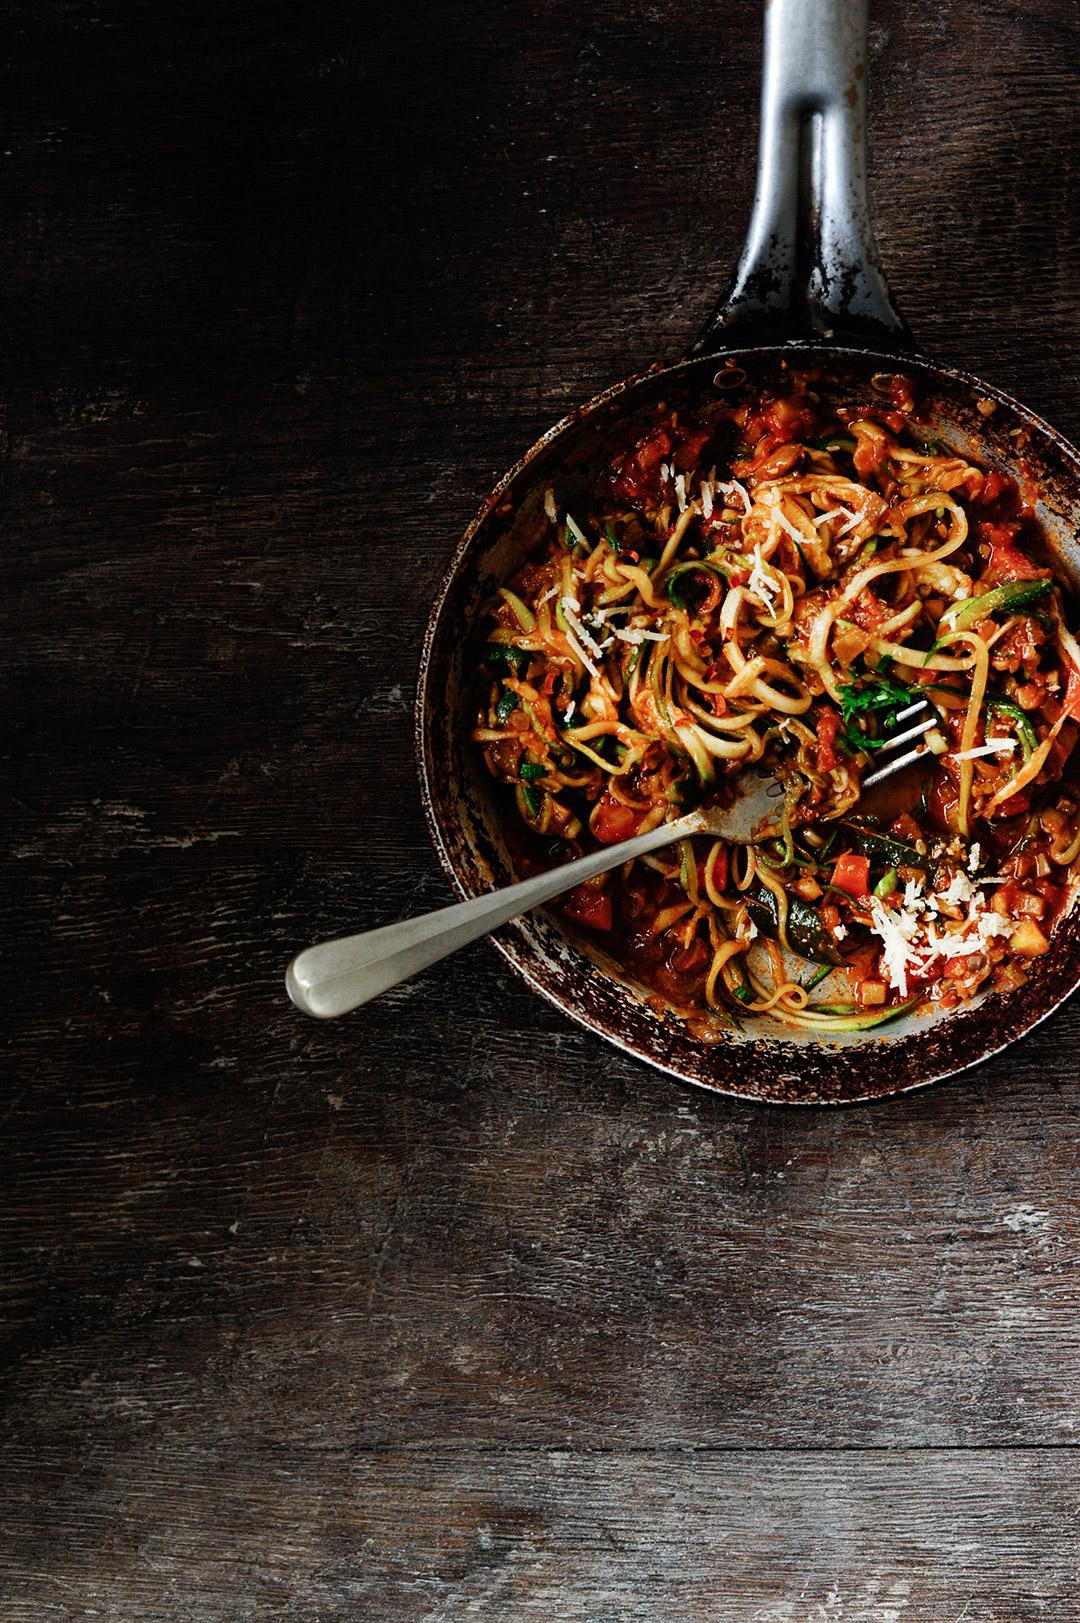 serving dumplings | Makaron z cukinii z grzybowym sosem bolognese